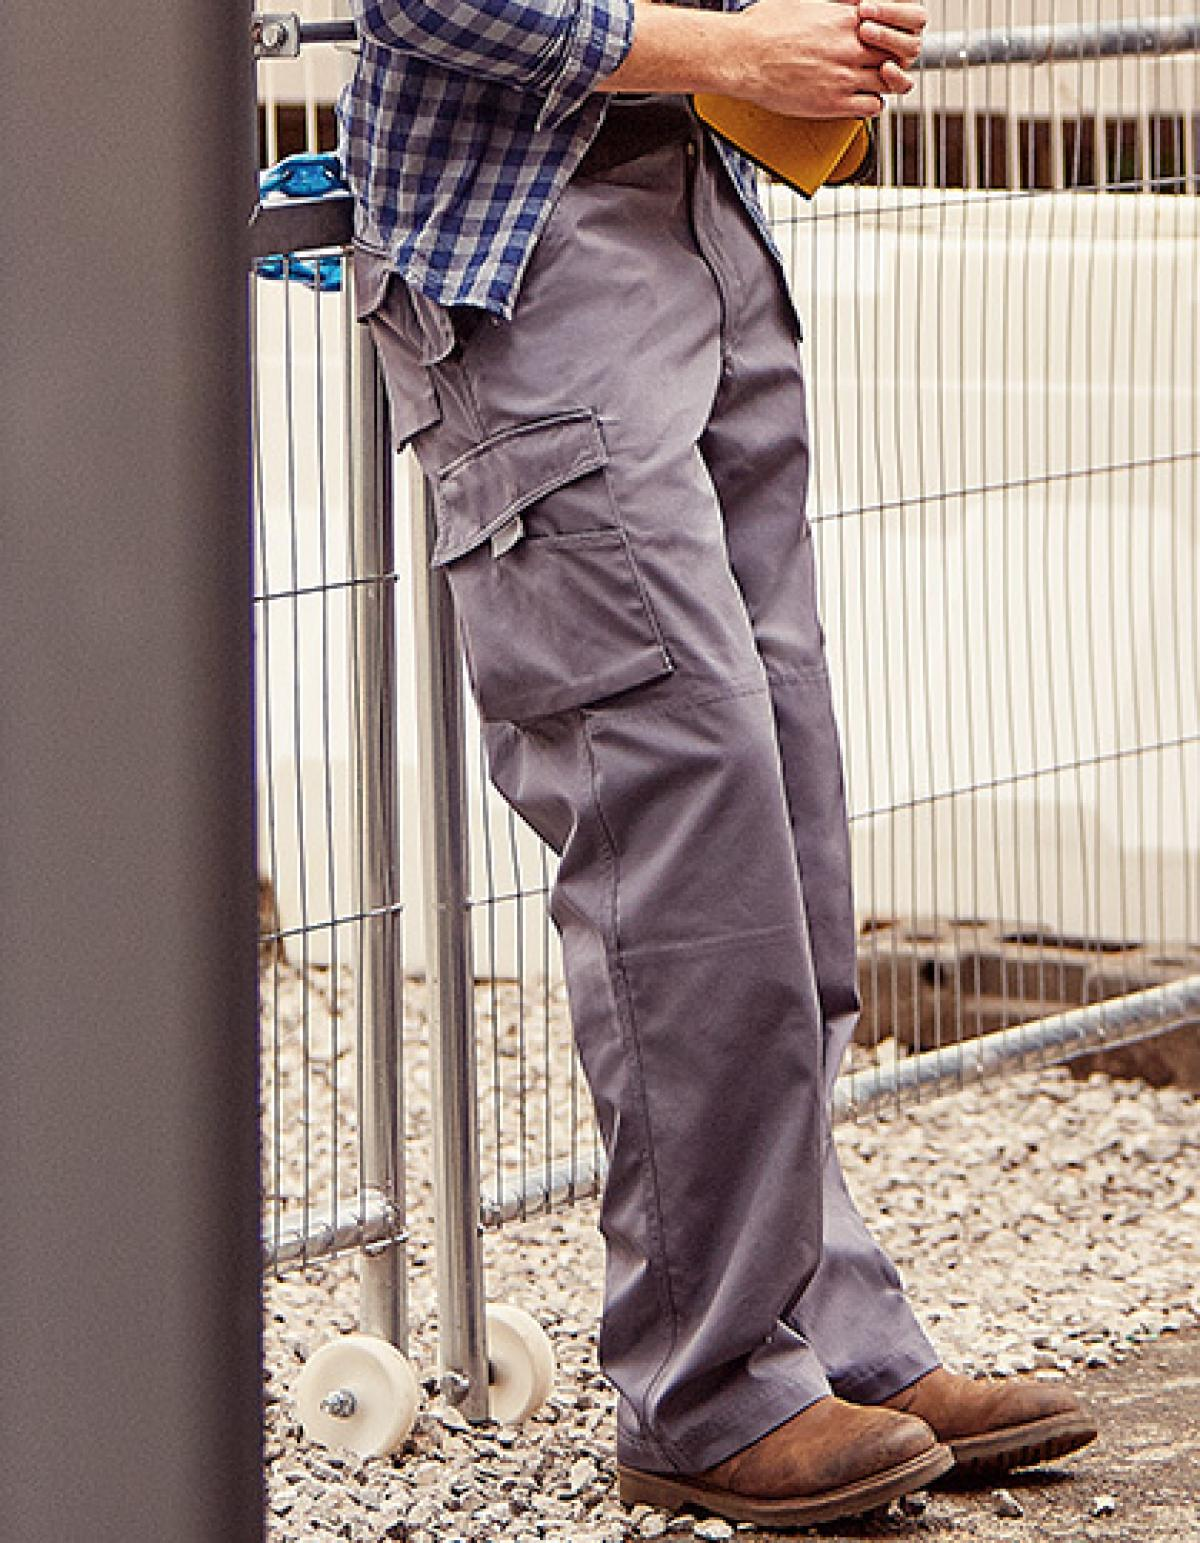 Strapazierfähige Workwear Arbeitshose Trocknergeeignet